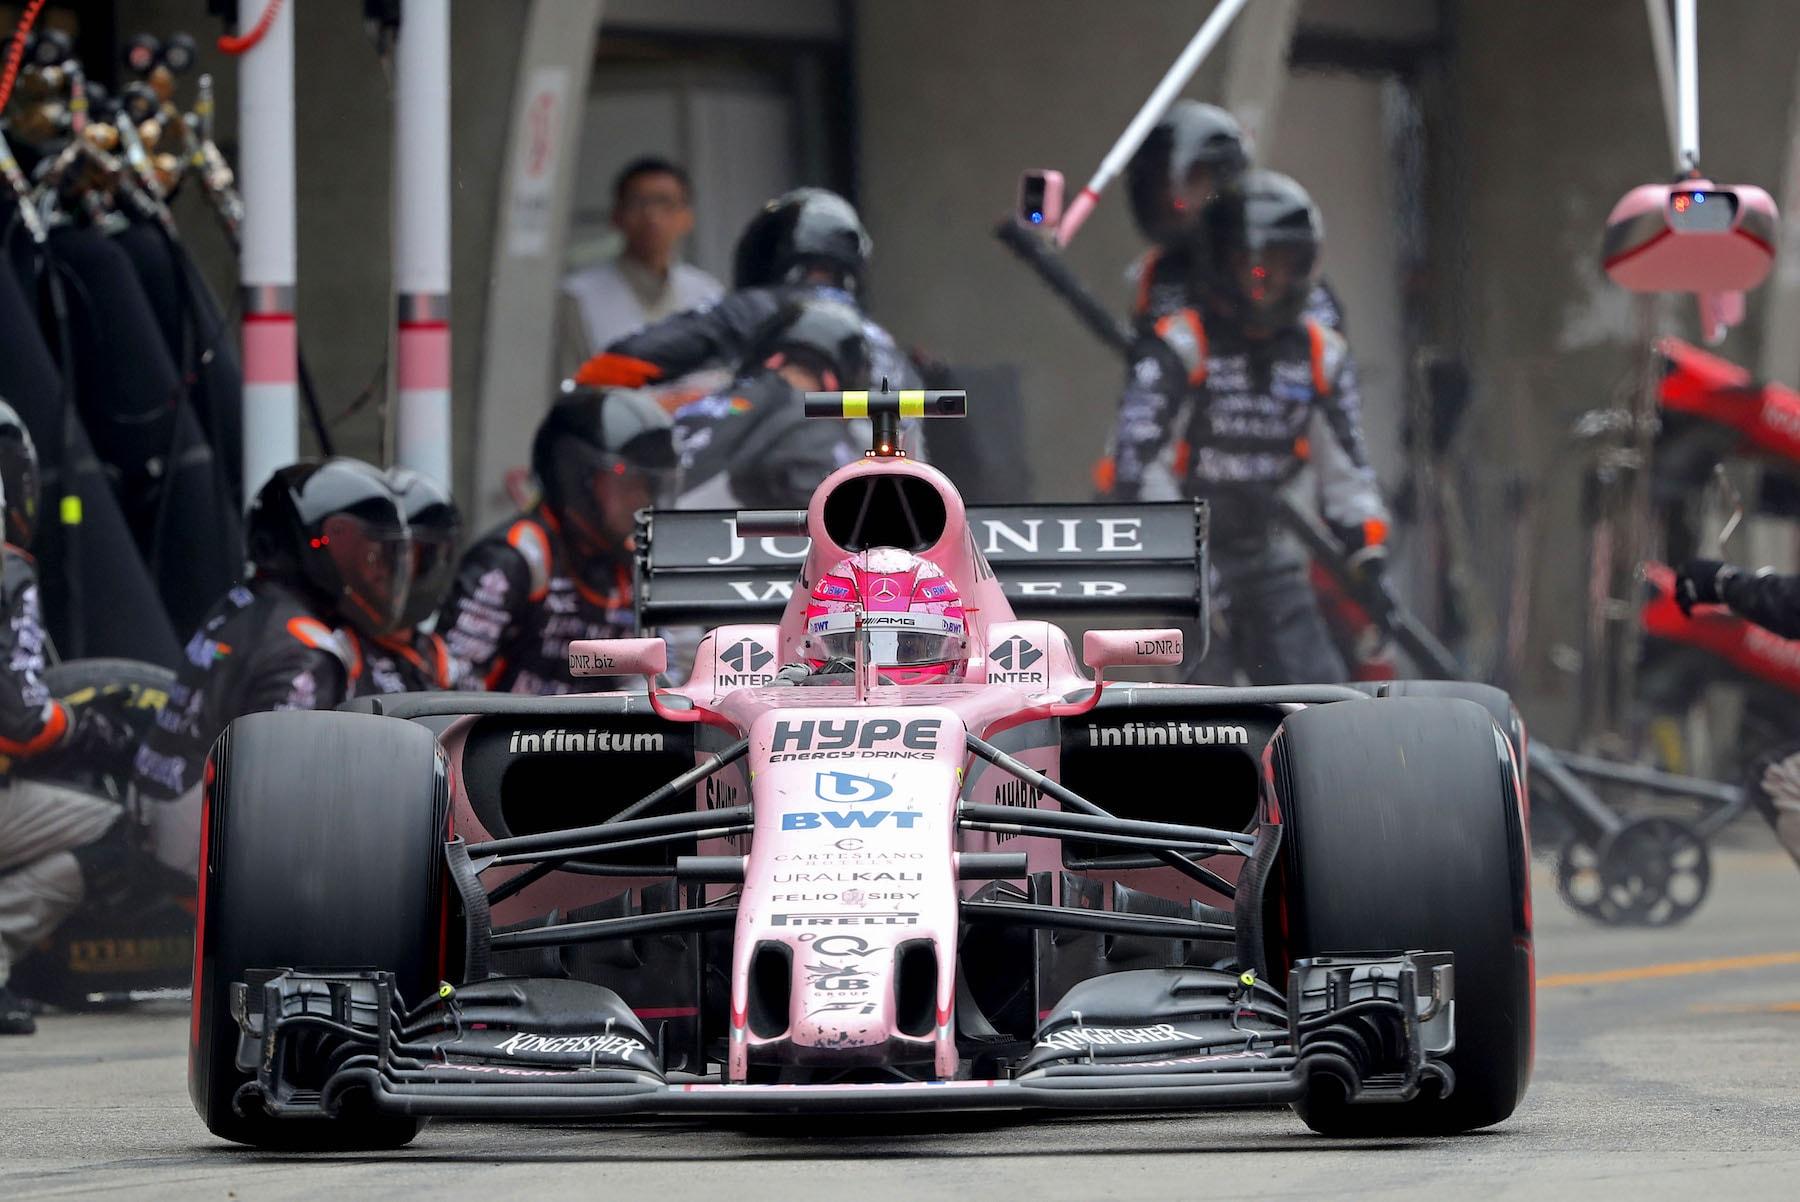 H 2017 Esteban Ocon | Force India VJM10 | 2017 Chinese GP P10 1 copy.jpg